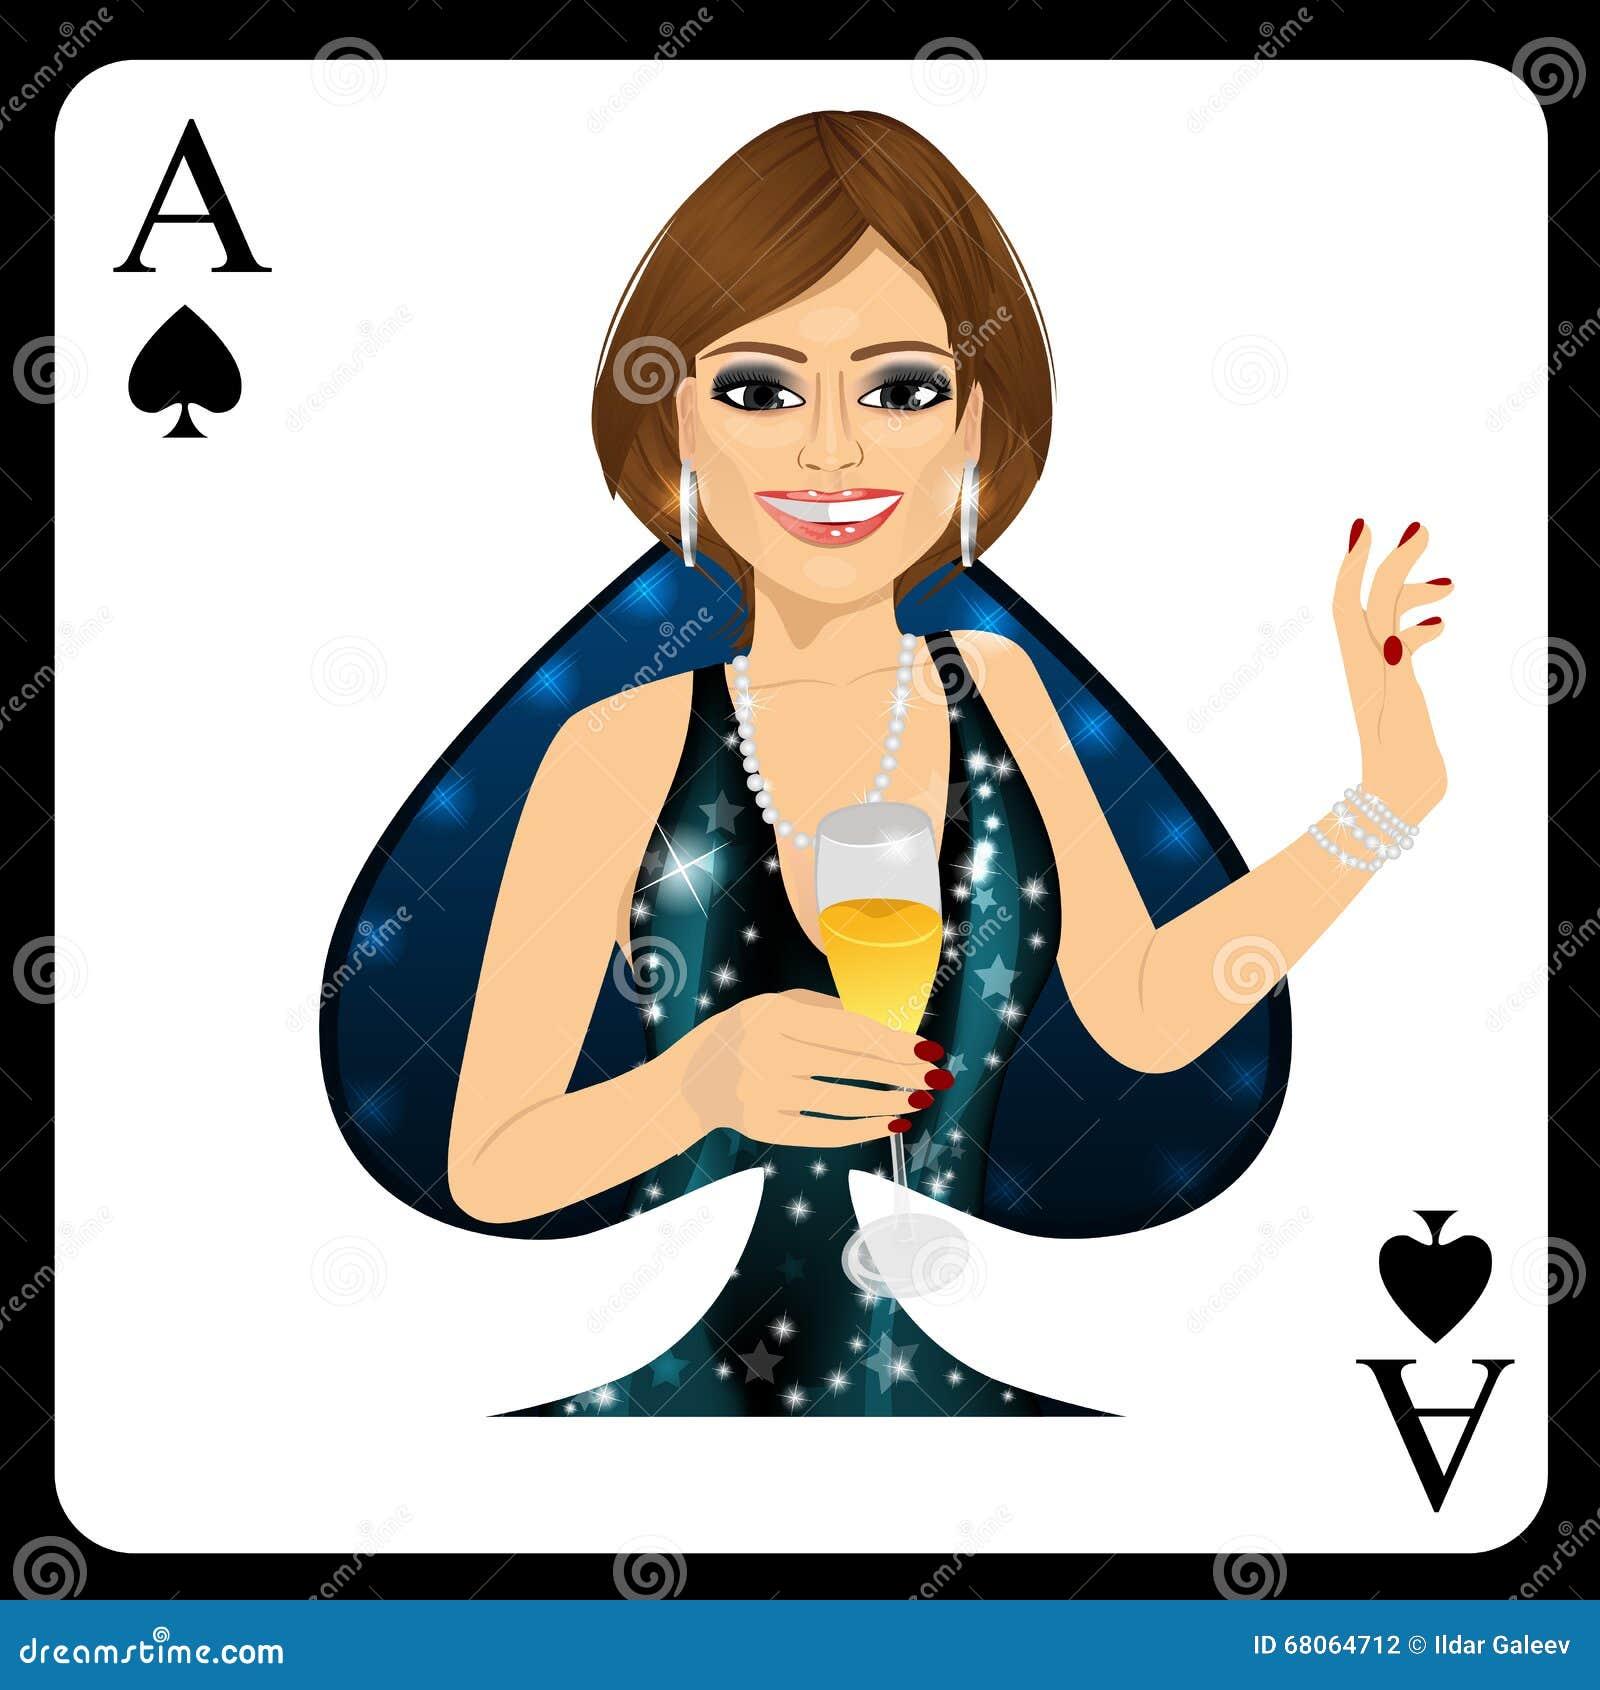 Pokerspiel Download